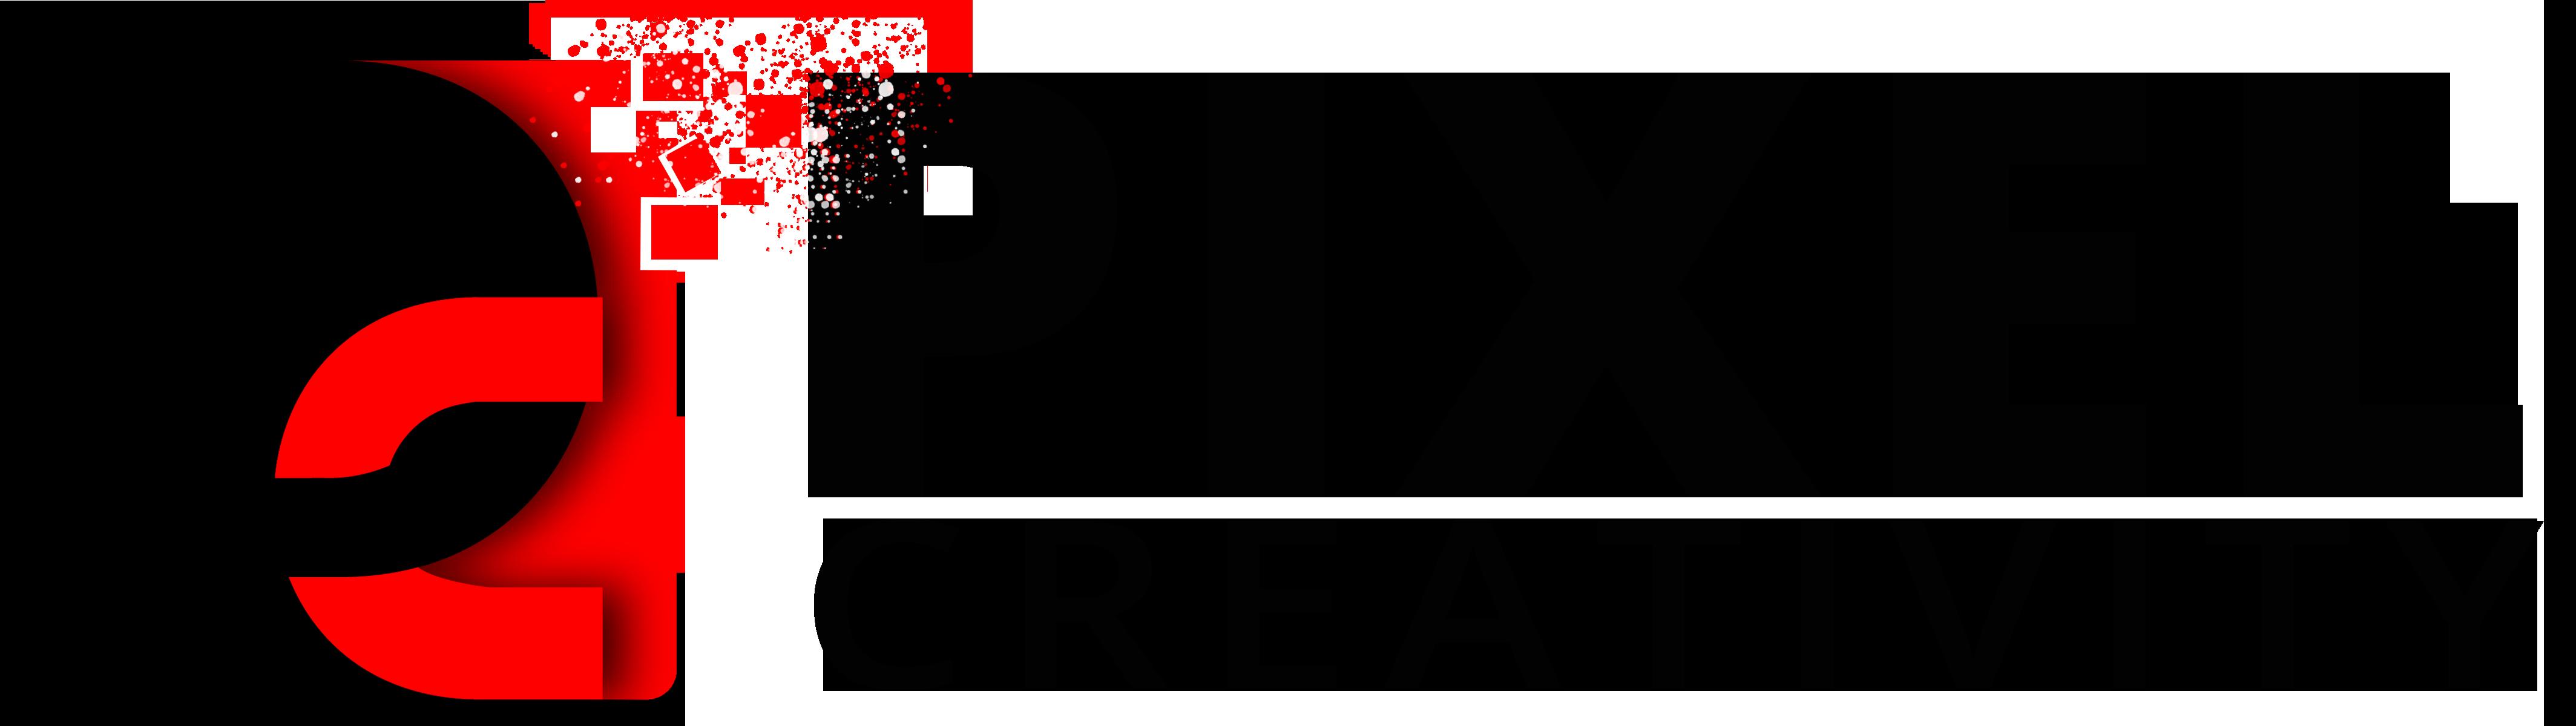 Pixel Creativity